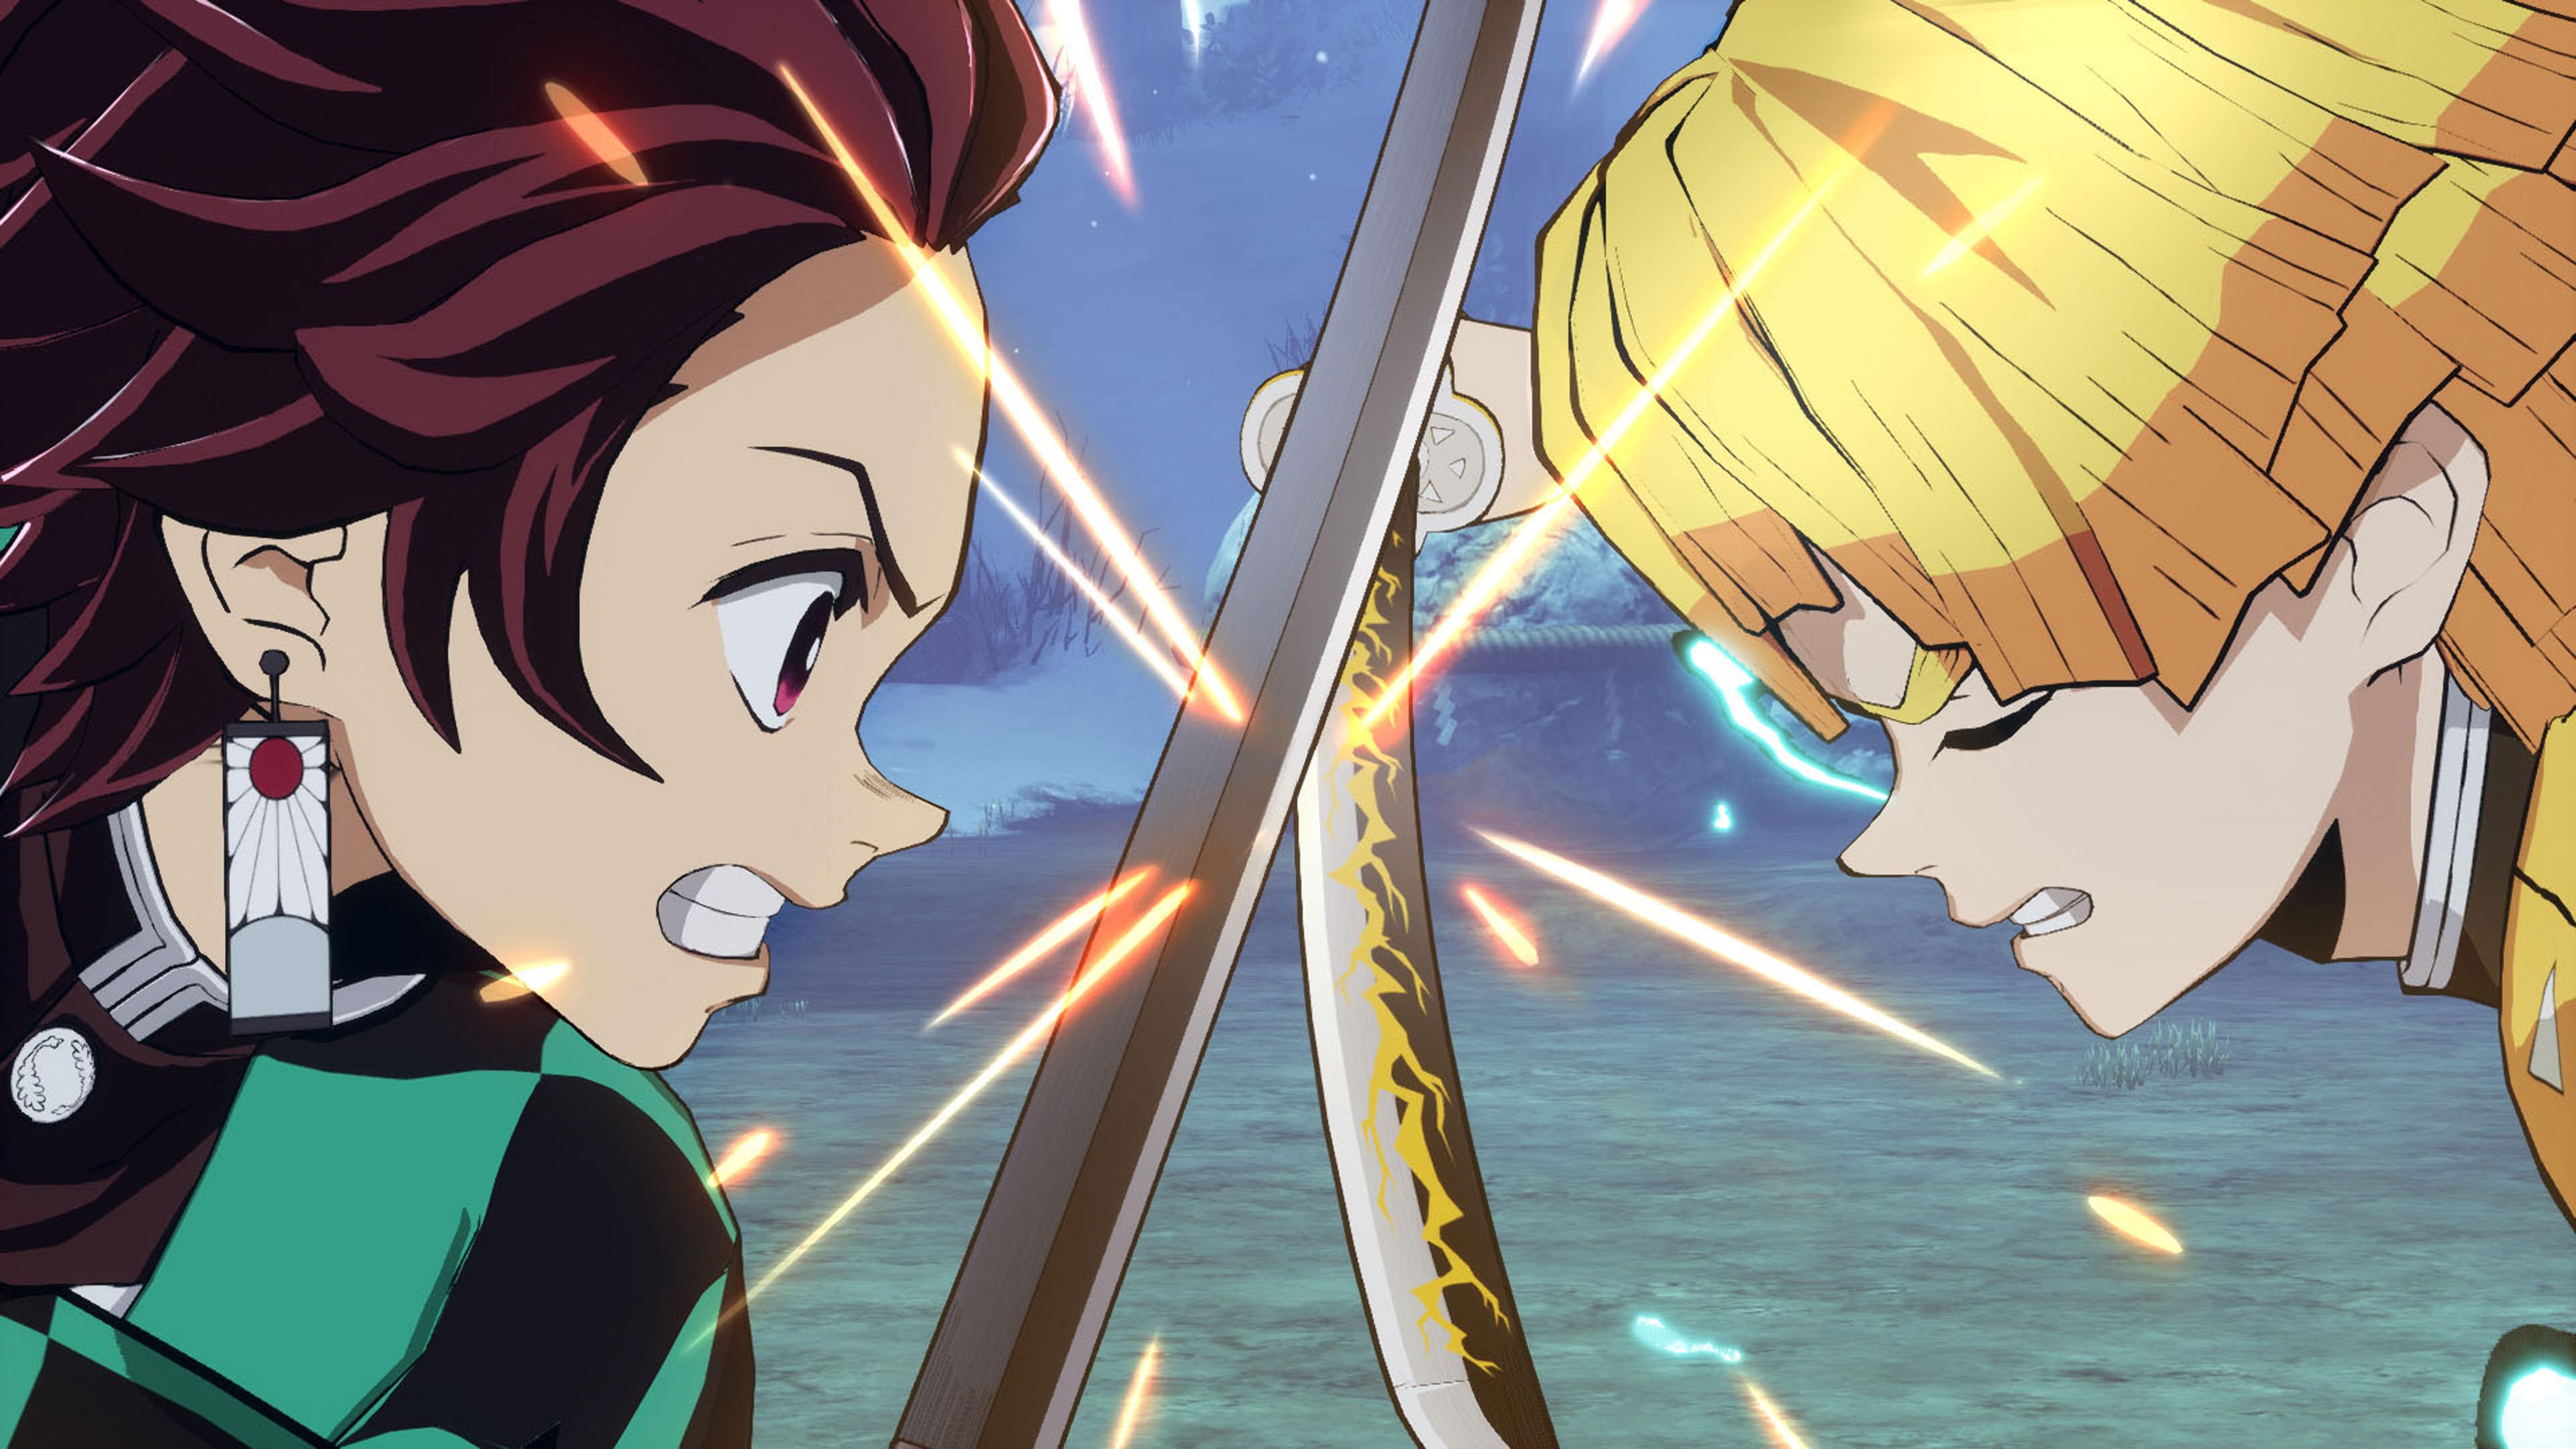 Скриншот №1 к Demon Slayer -Kimetsu no Yaiba- The Hinokami Chronicles Deluxe Edition PS4 and PS5